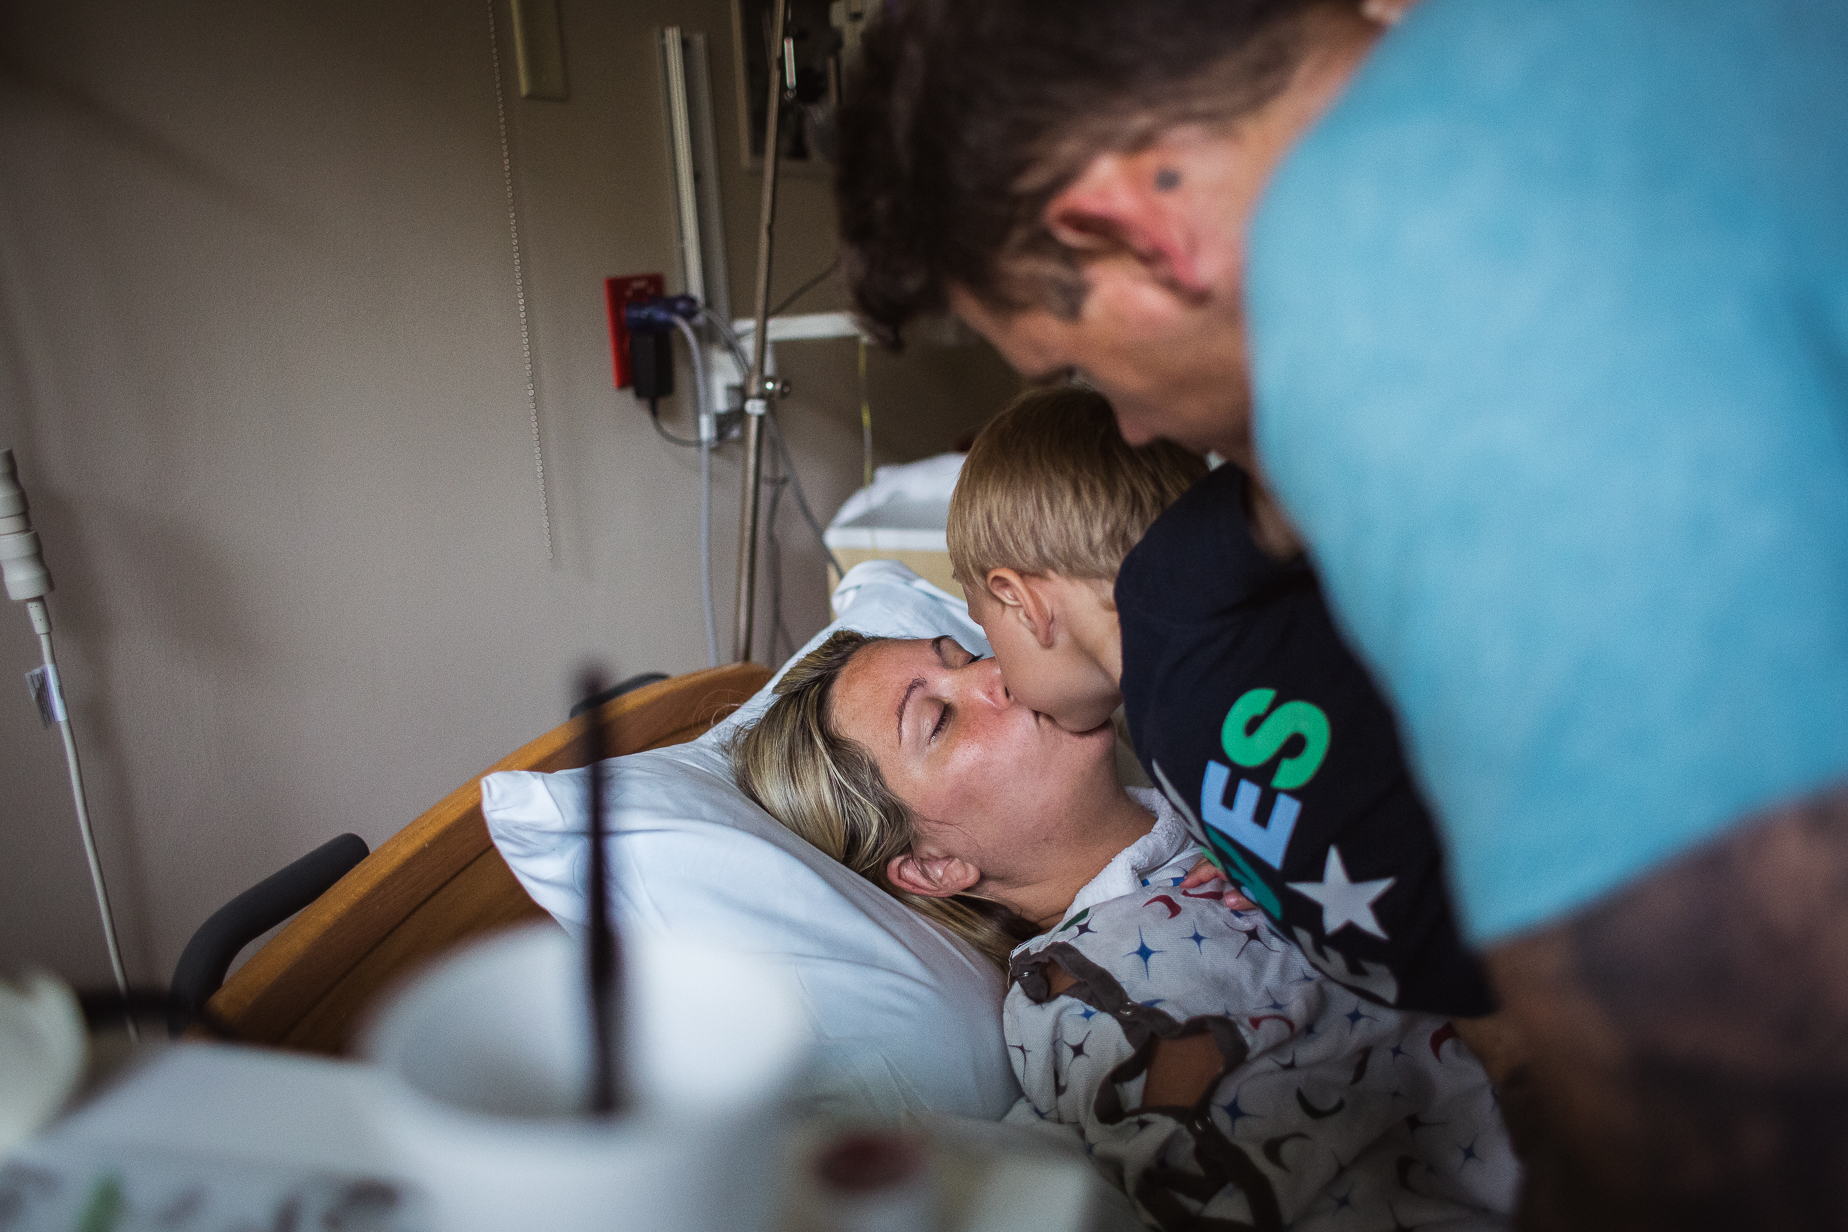 west-boca-hospital-gentle-c-section-epidural-vbac-home-birth-mary-harris-palms-birth-house-center-4.jpg